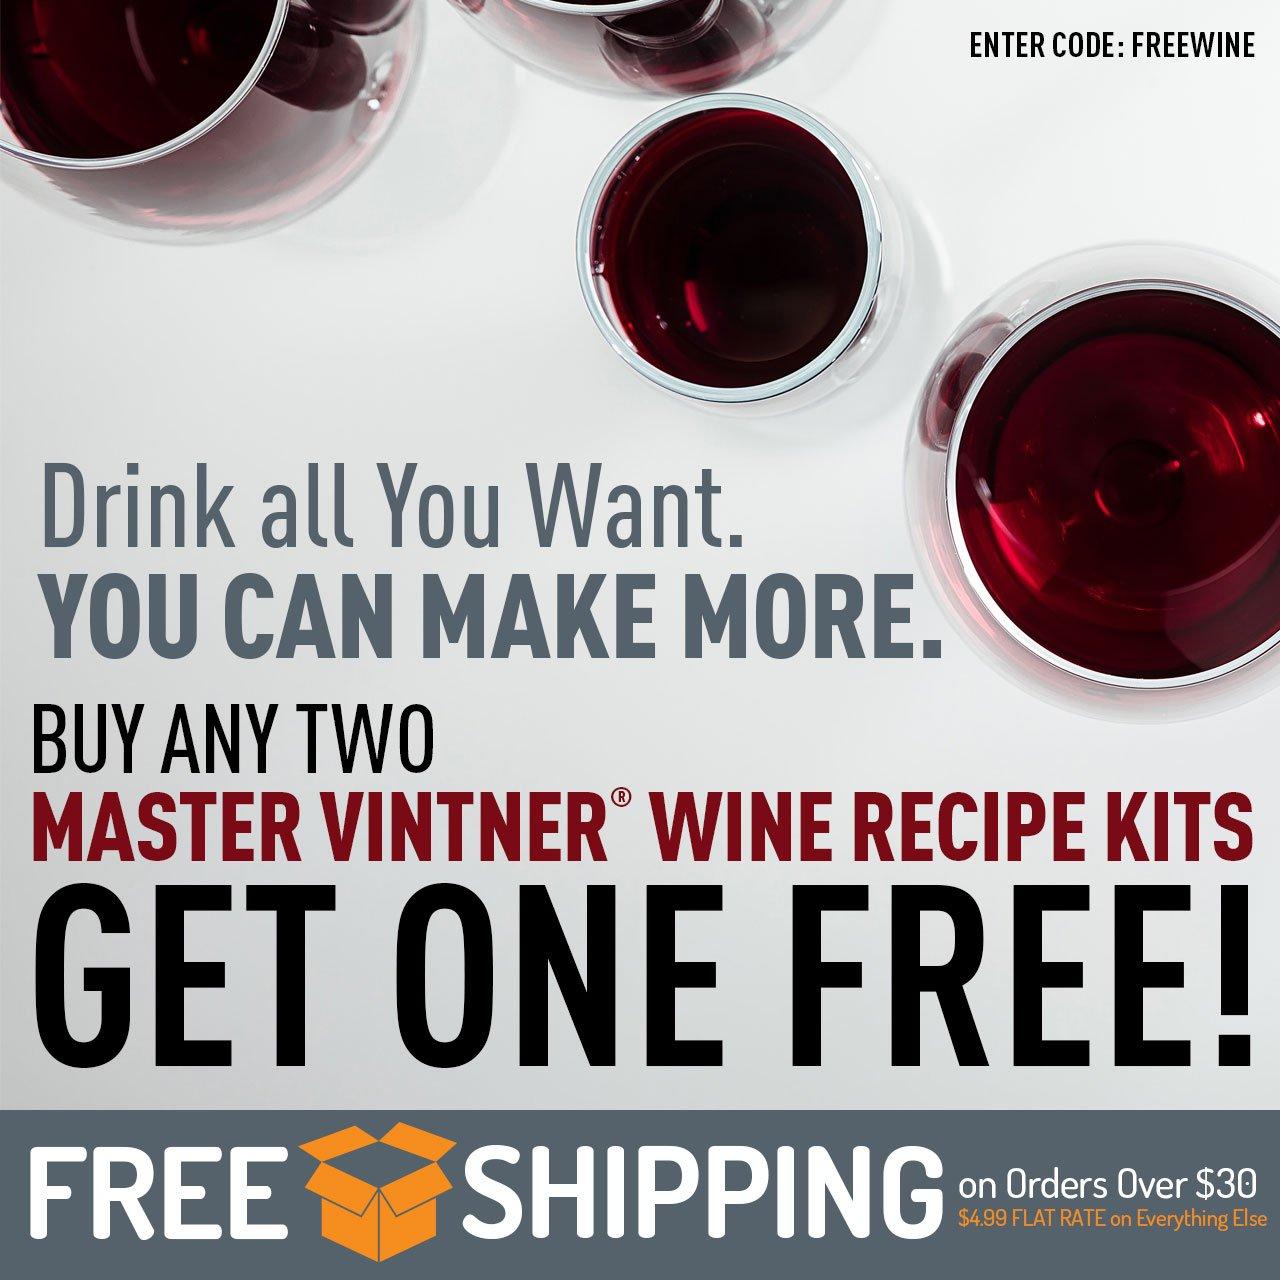 Buy Two Master Vintner Wine Kits, Get One Free